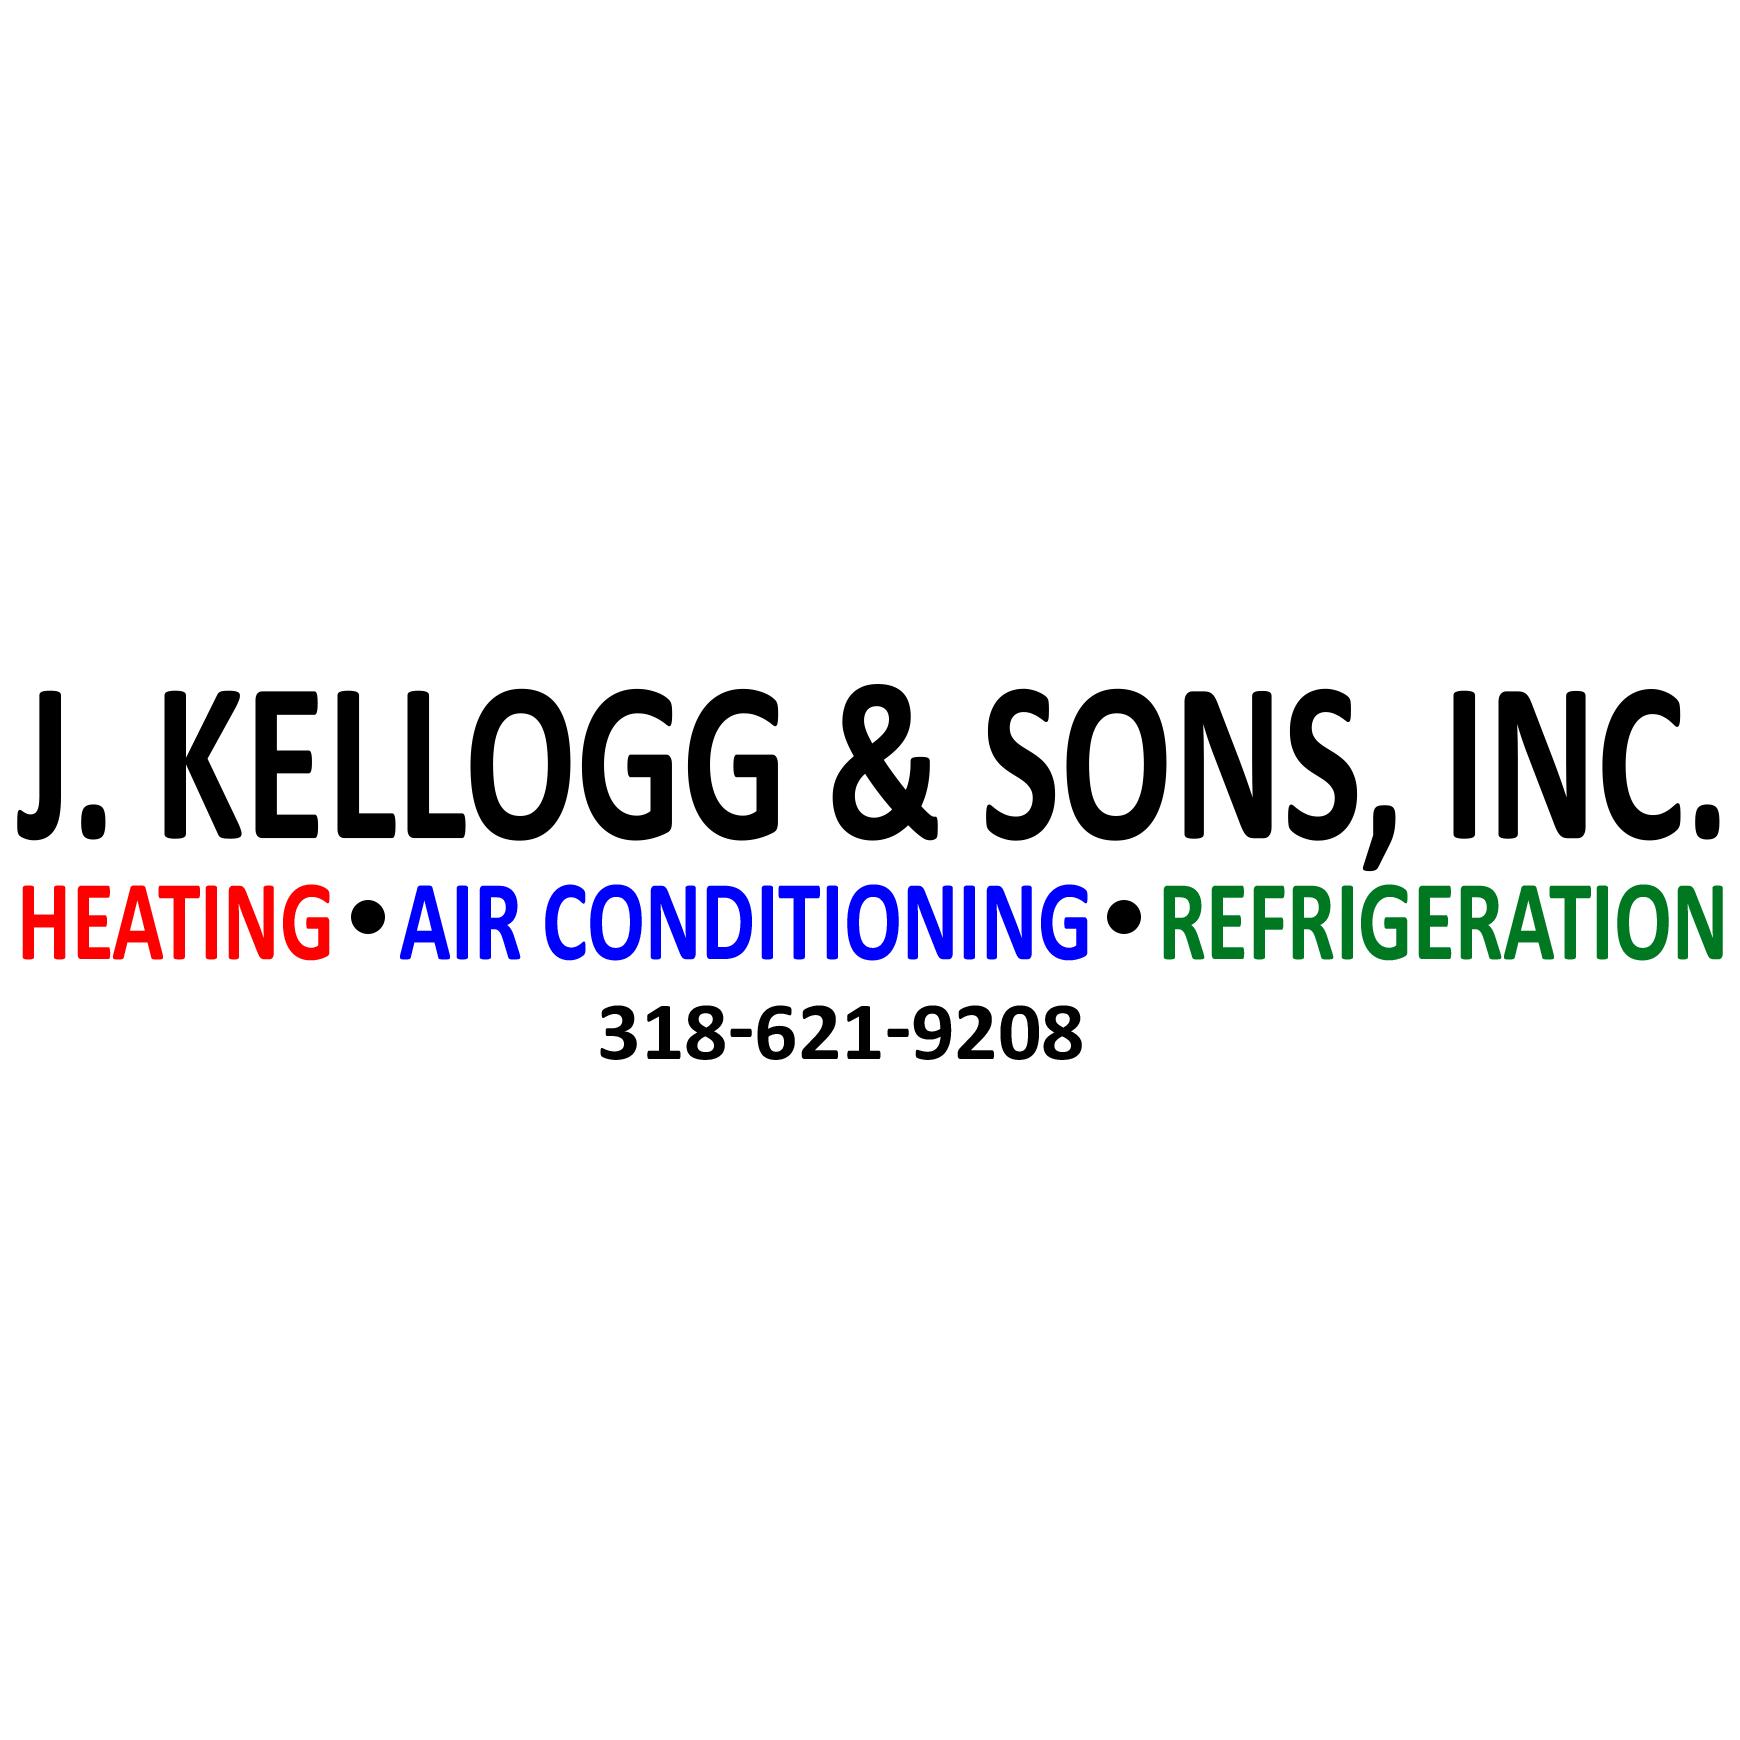 J. Kellogg & Sons